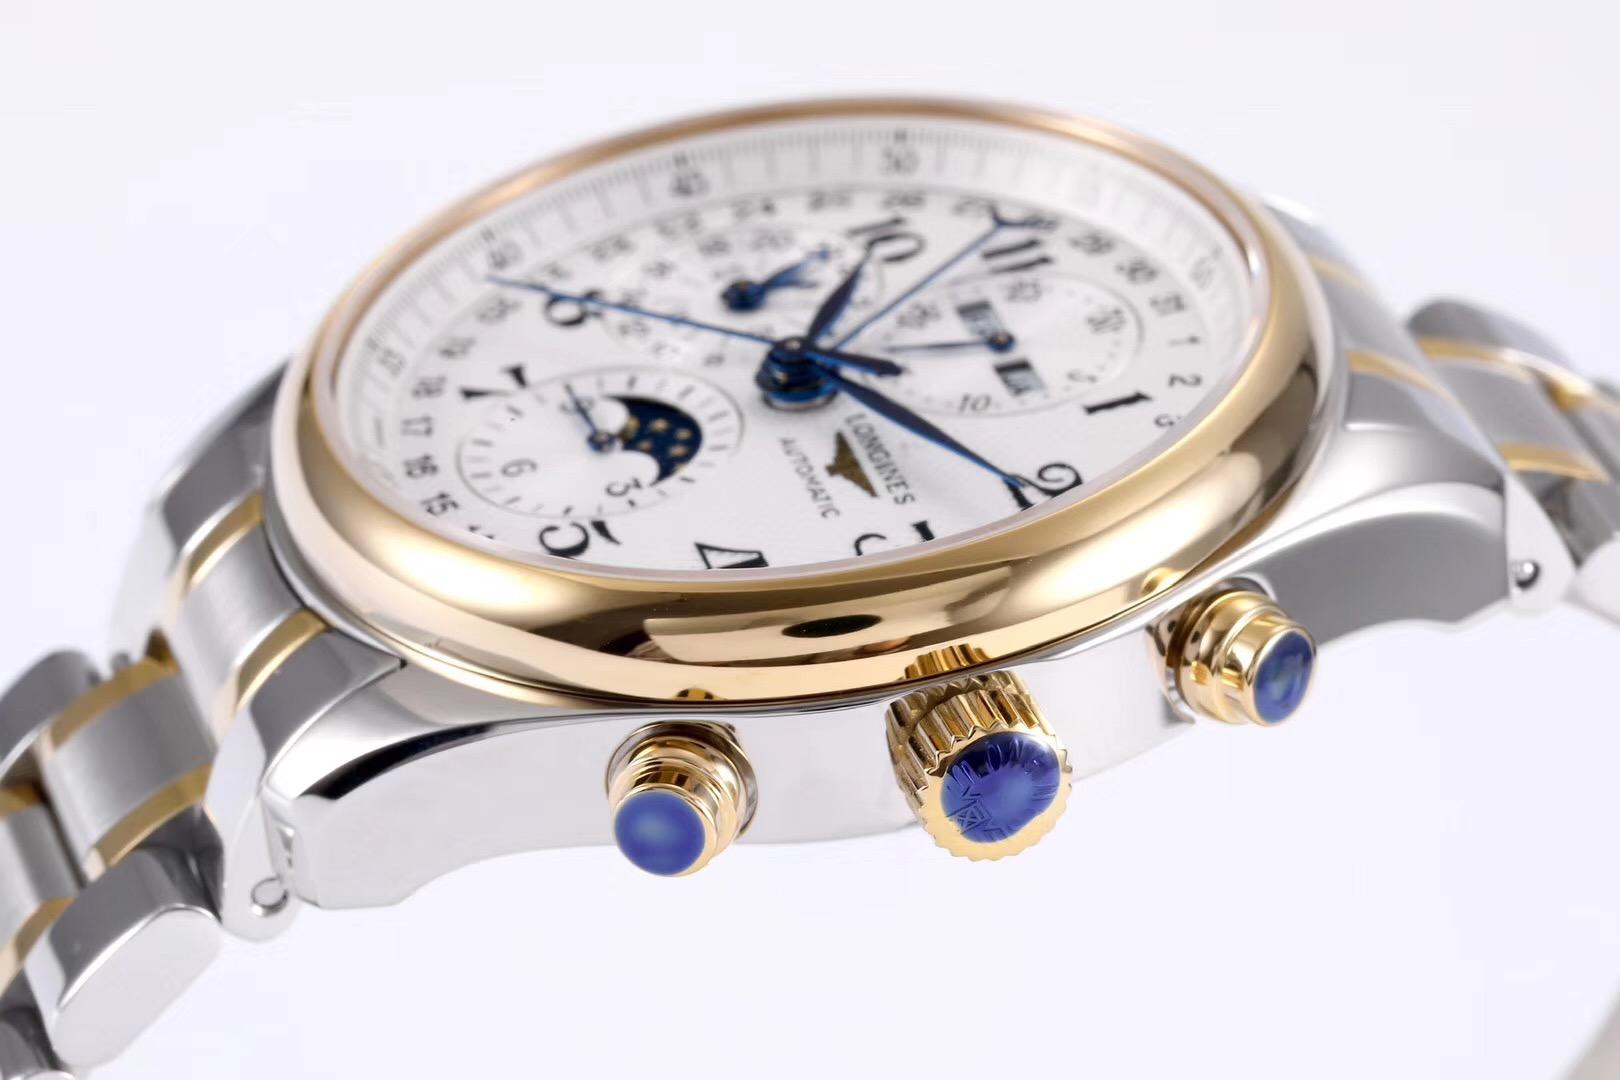 GS浪琴名匠八针月相40直径新款L.687机芯顶级复刻手表